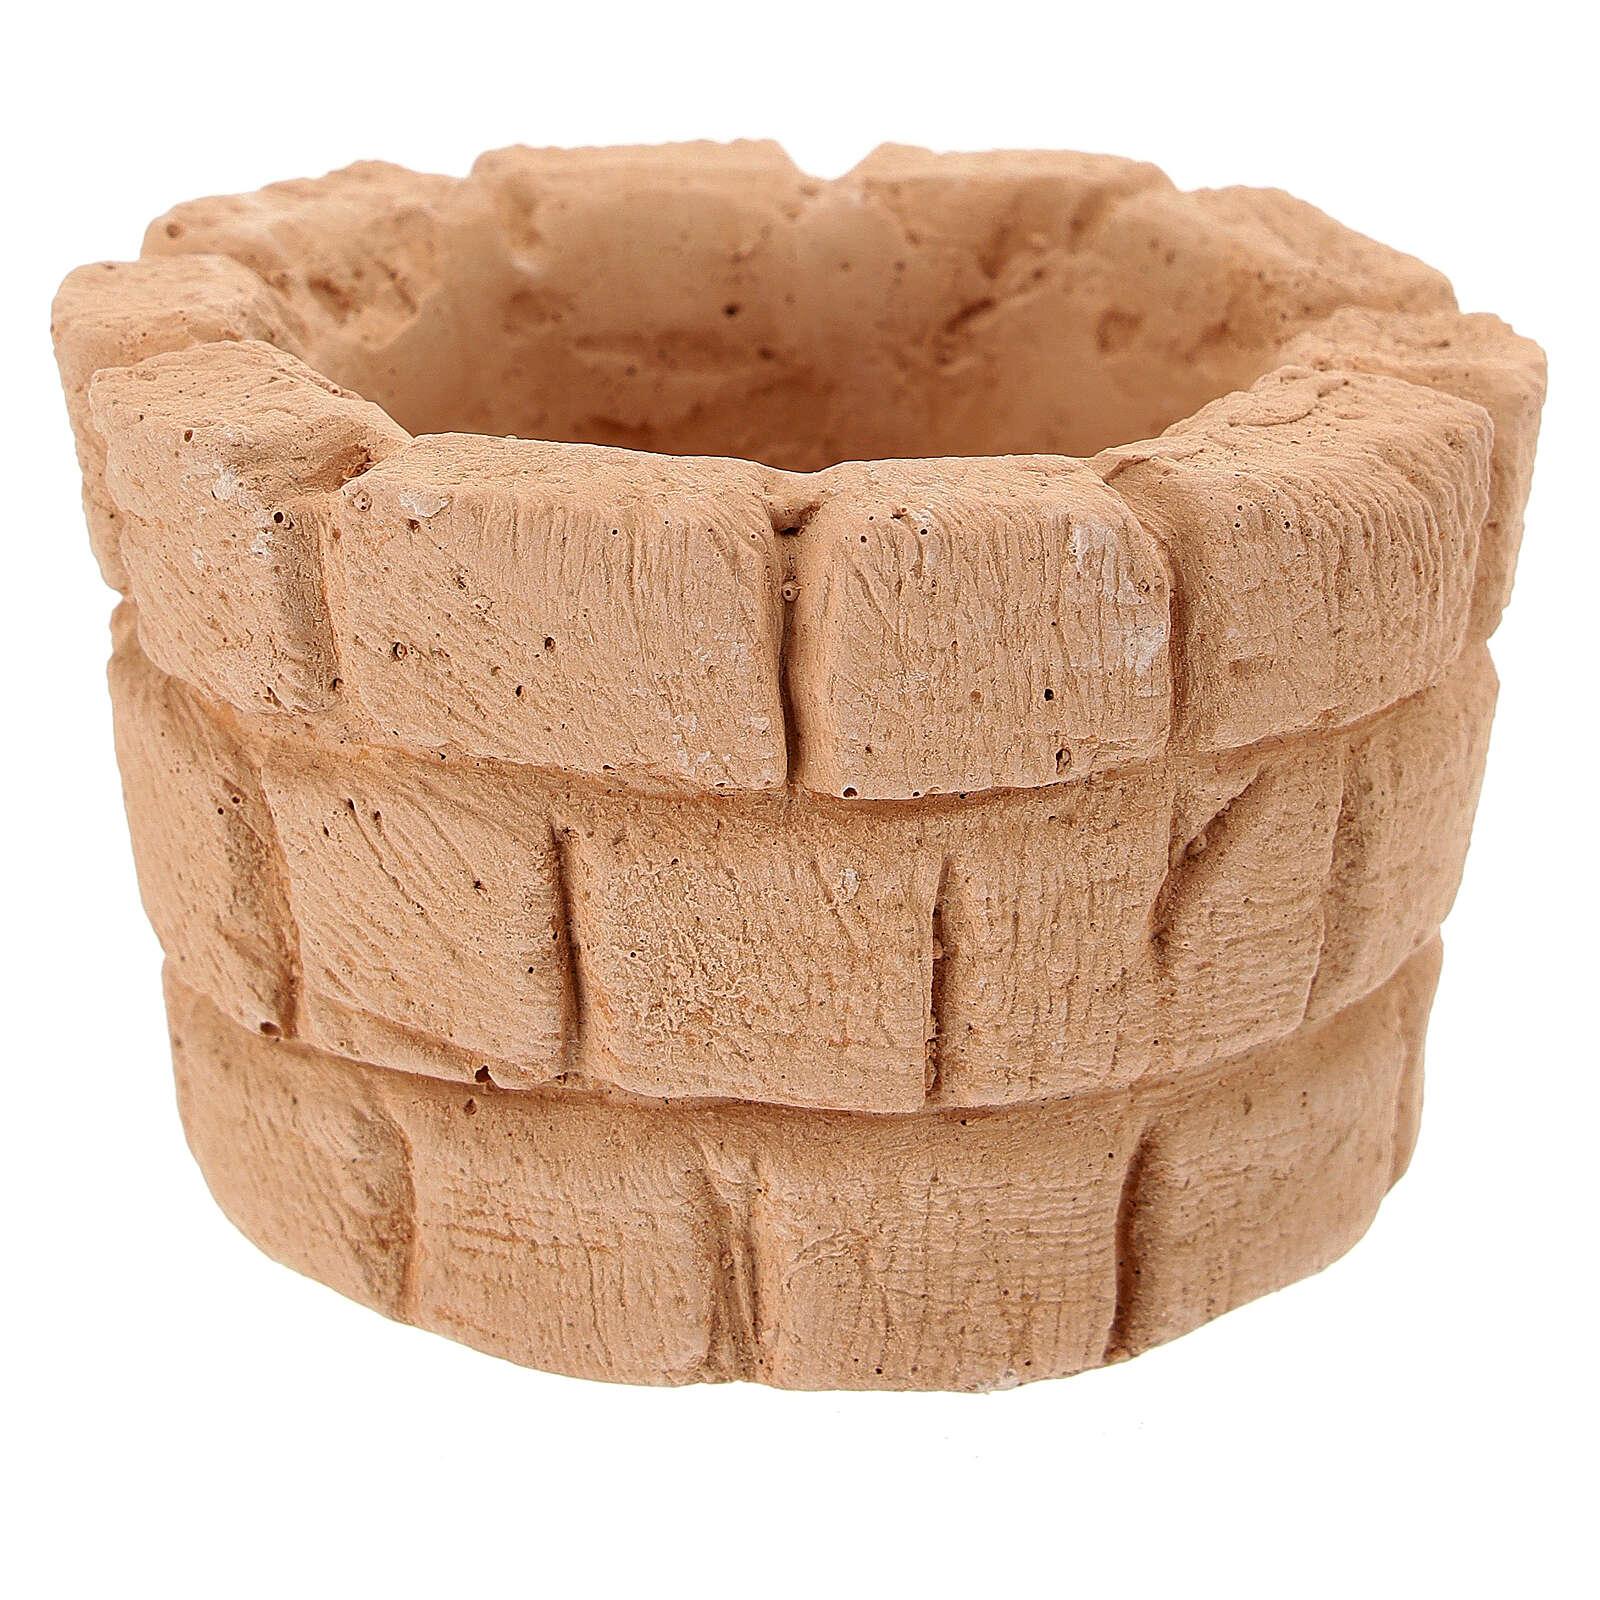 Blocco fontana terracotta diam 6 cm presepe 10 cm 4